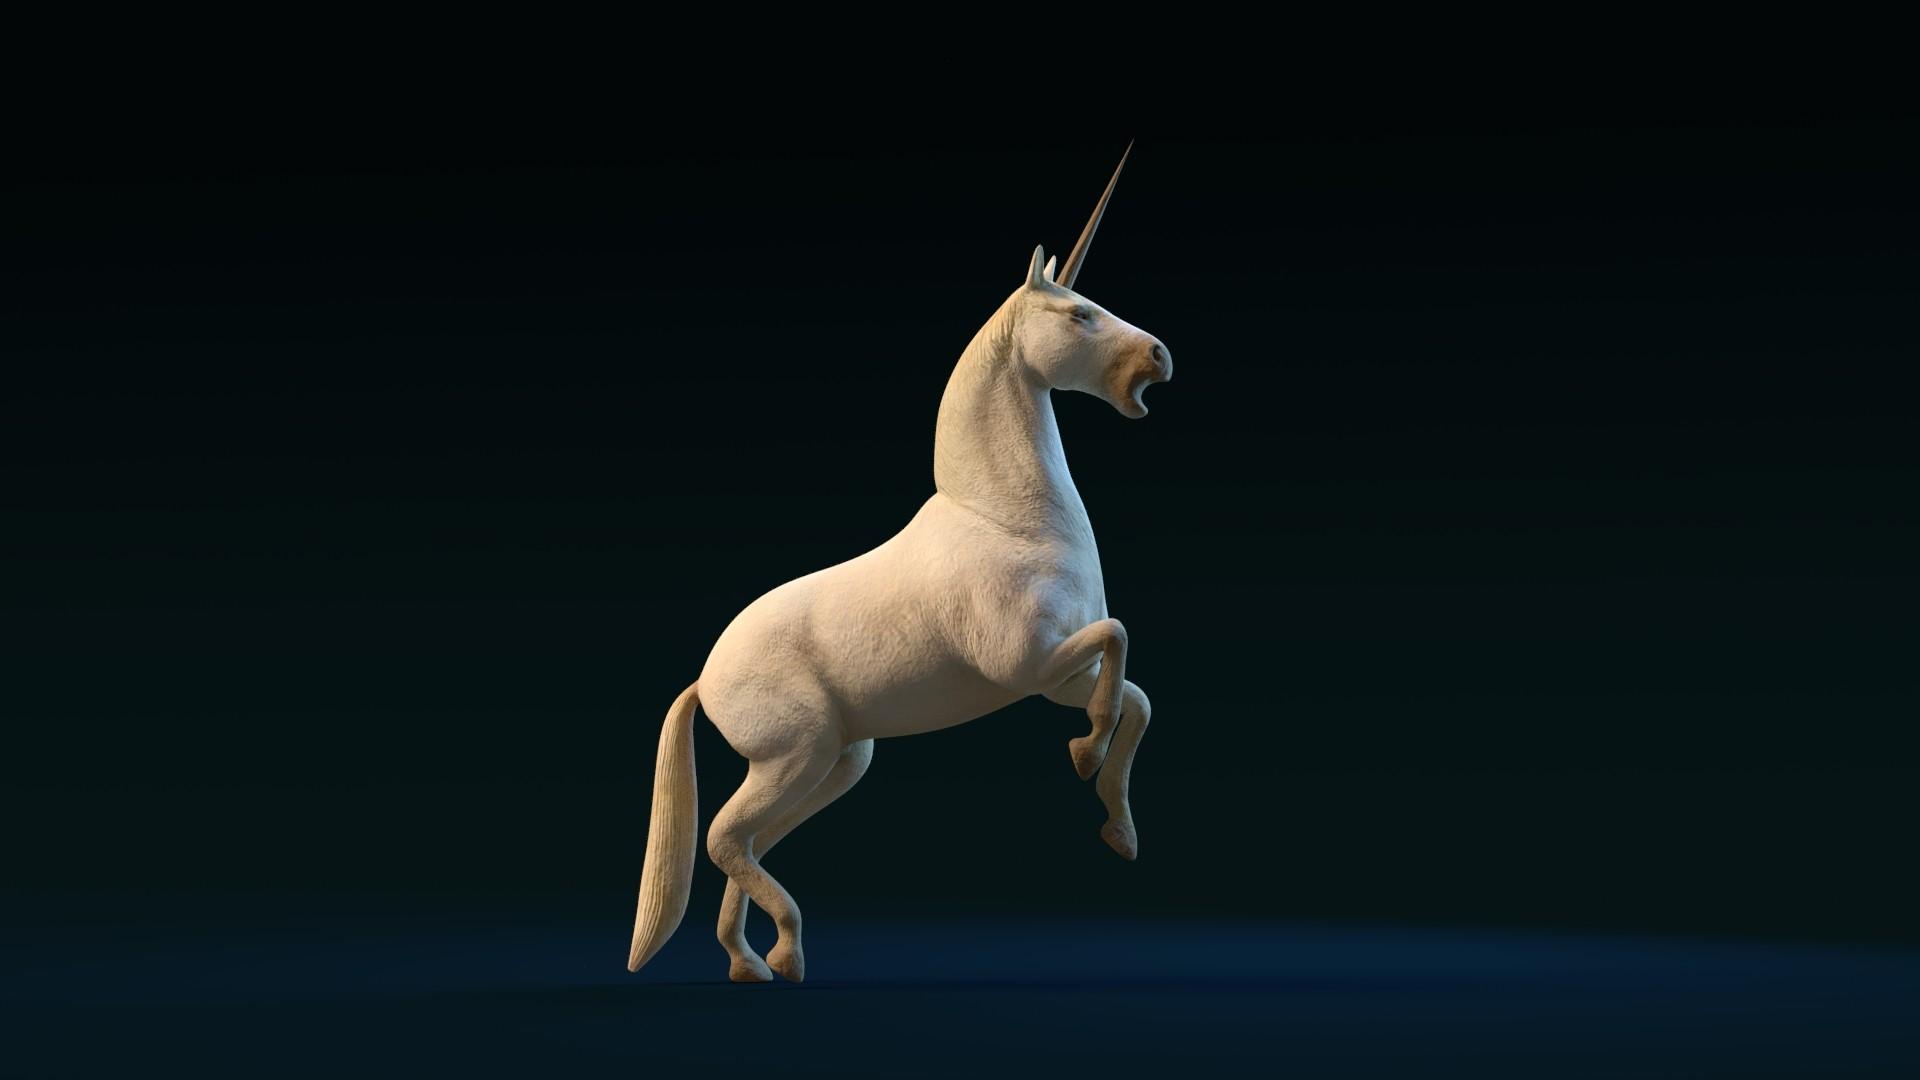 Day7.Unicorn Unicorn Time:1 Hour